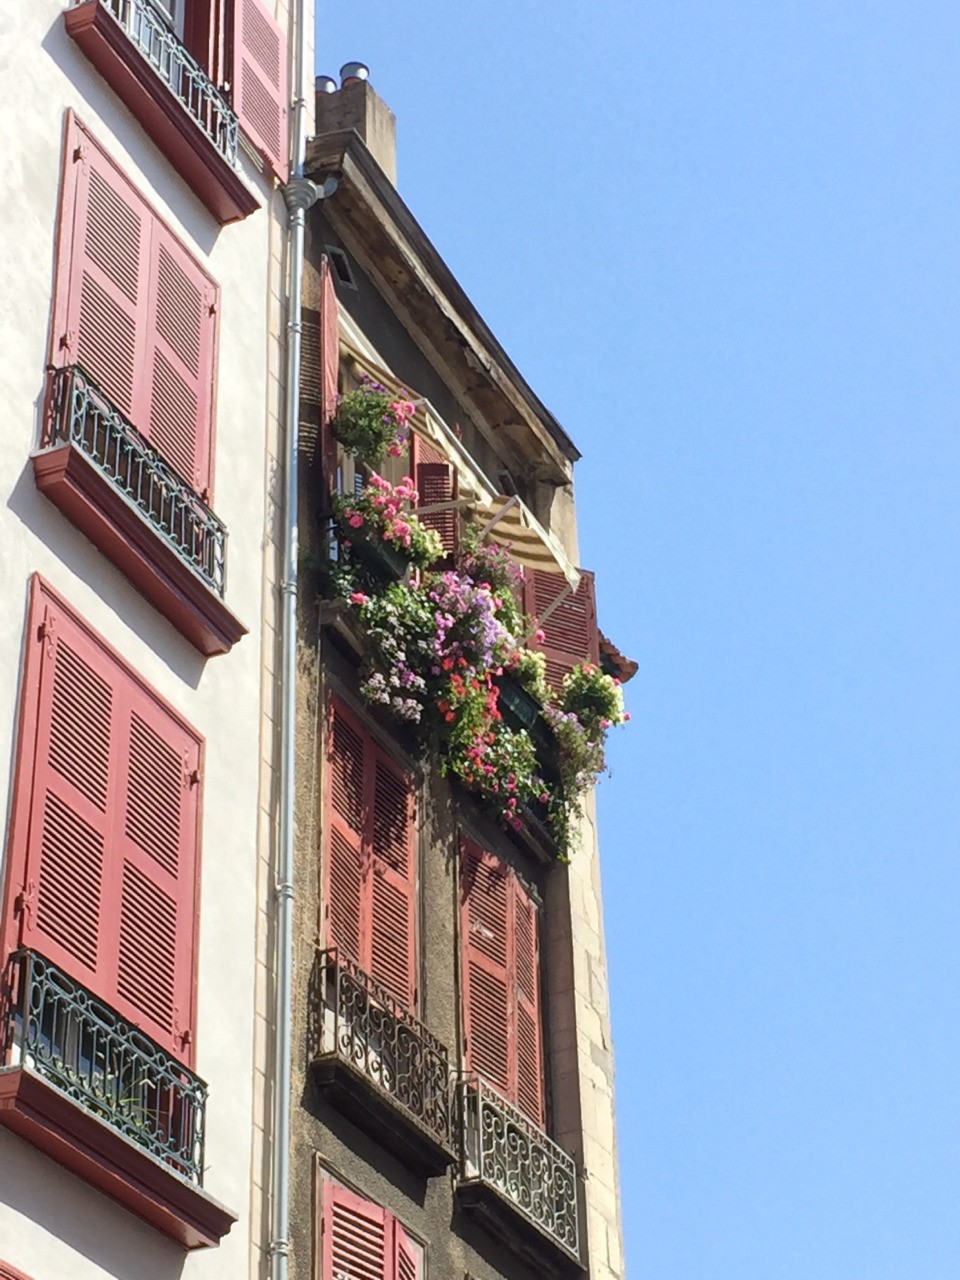 Balcons fleuris et canal de Bayonne.